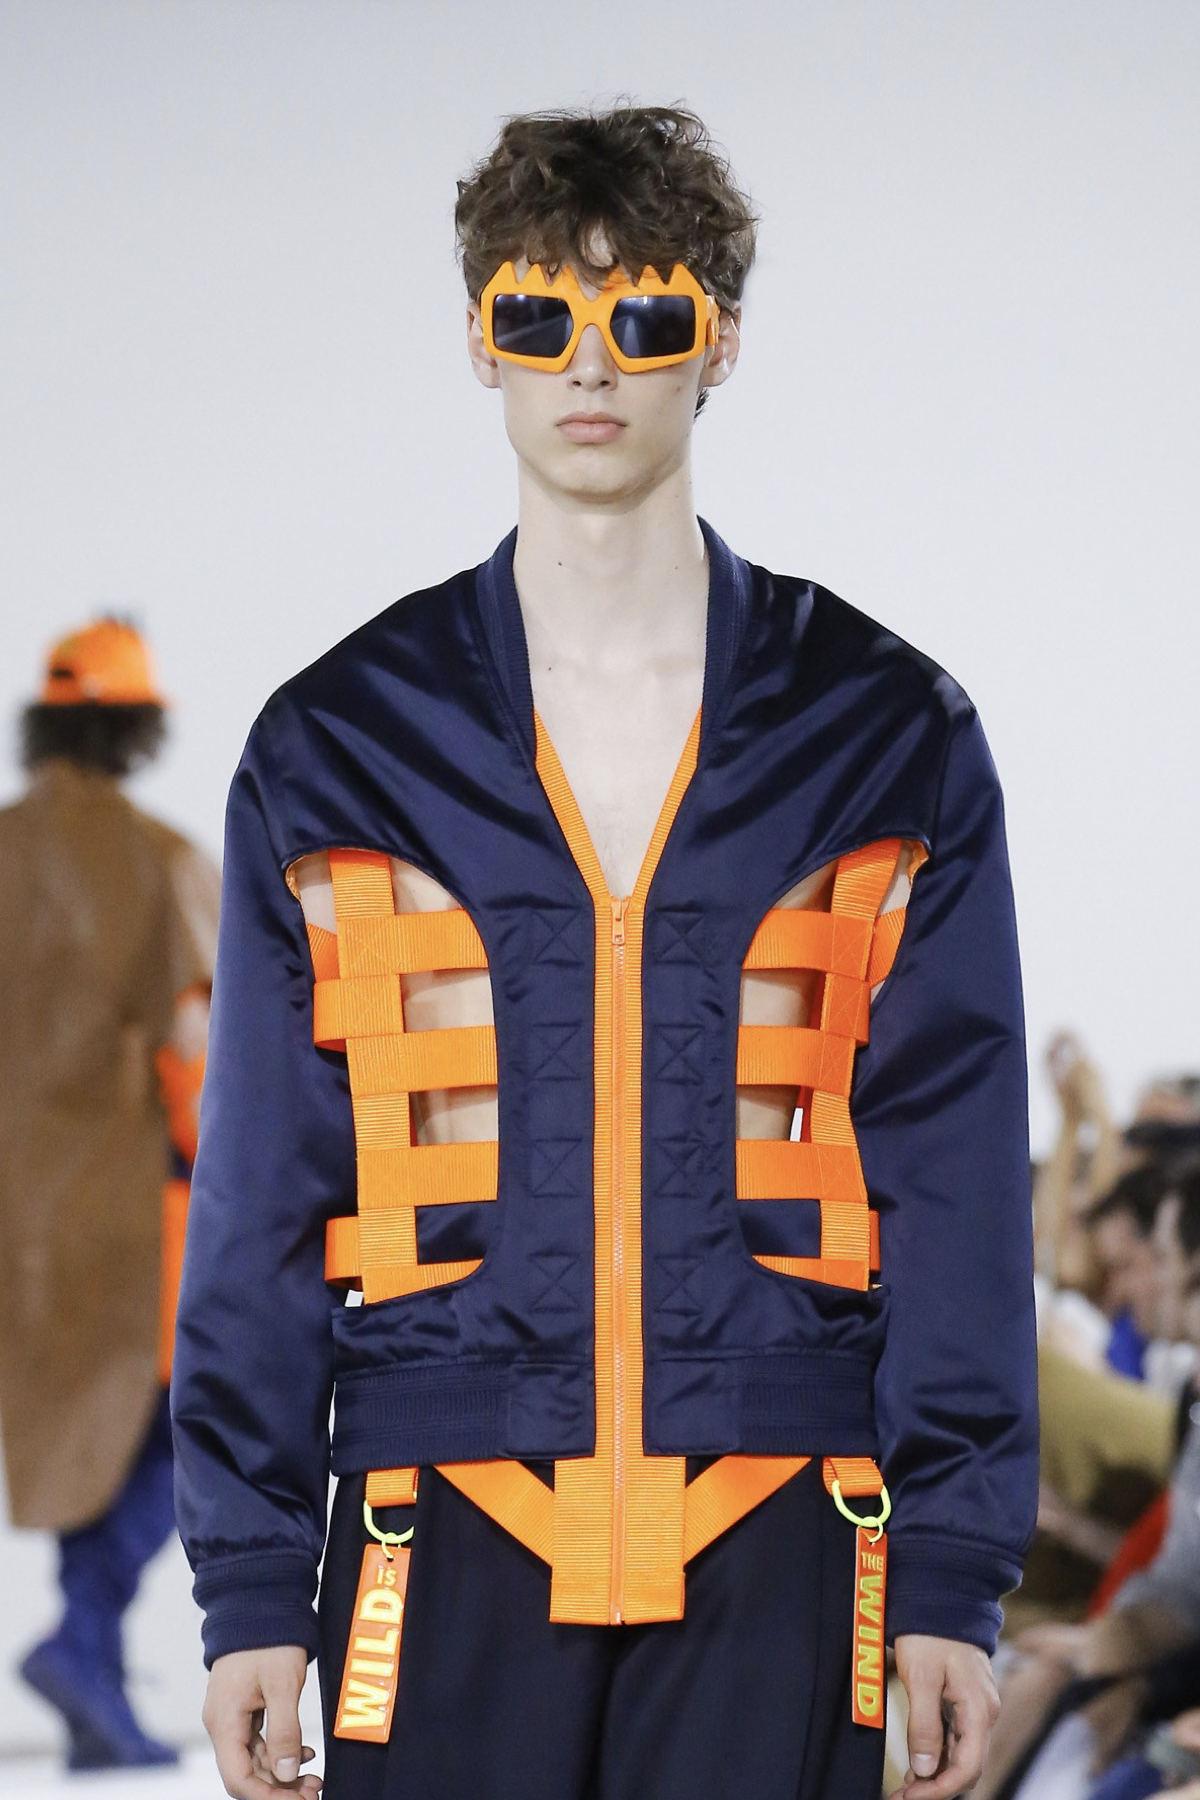 FAKBYFAK x Walter Van Beirendonck  Bliksem Sunglasses. Neon Orange Code: FBF-09-13-08